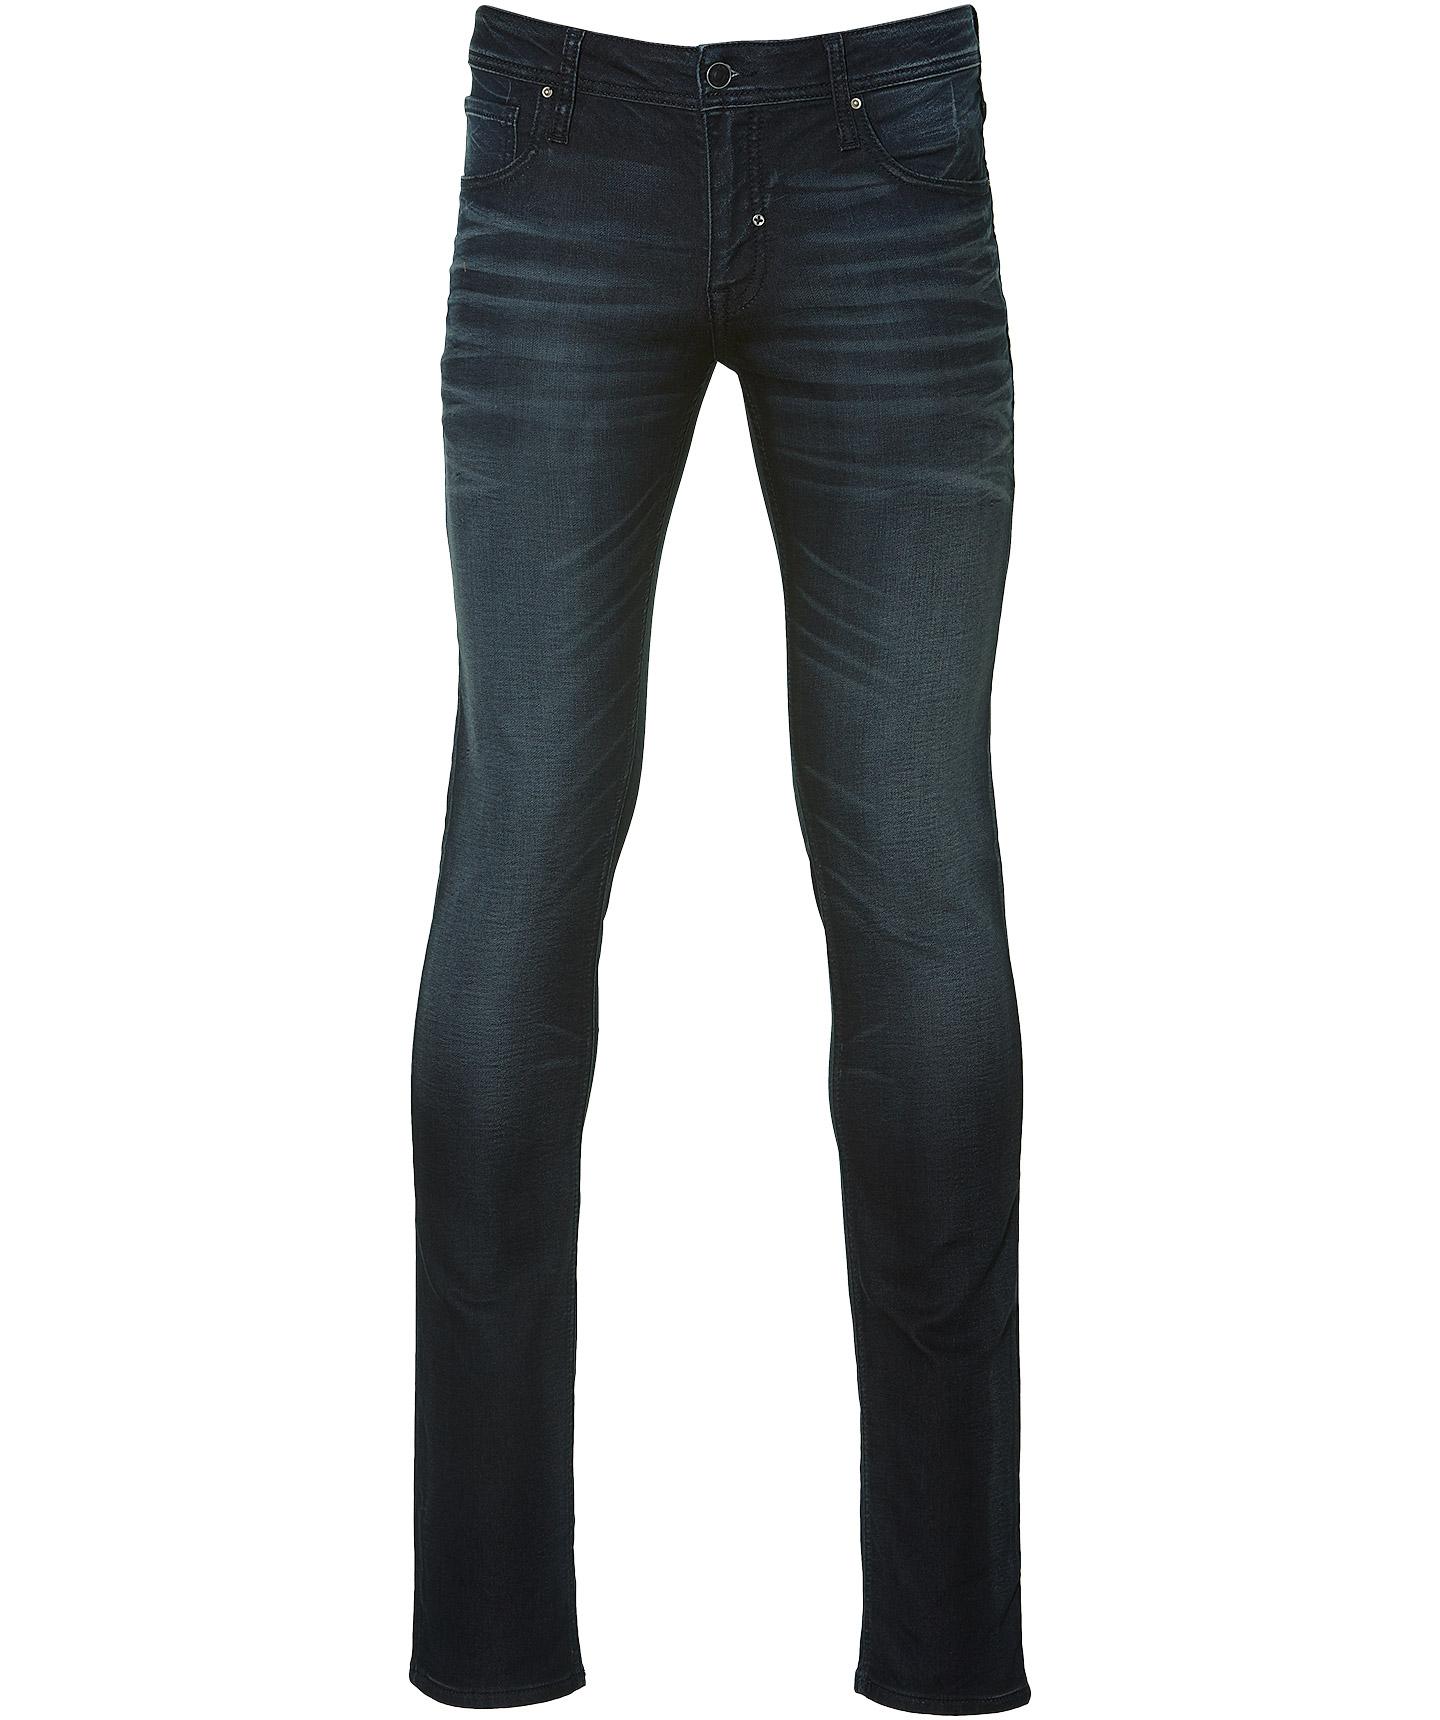 Afbeelding van Antony Morato Jeans Slim Fit Blauw 46